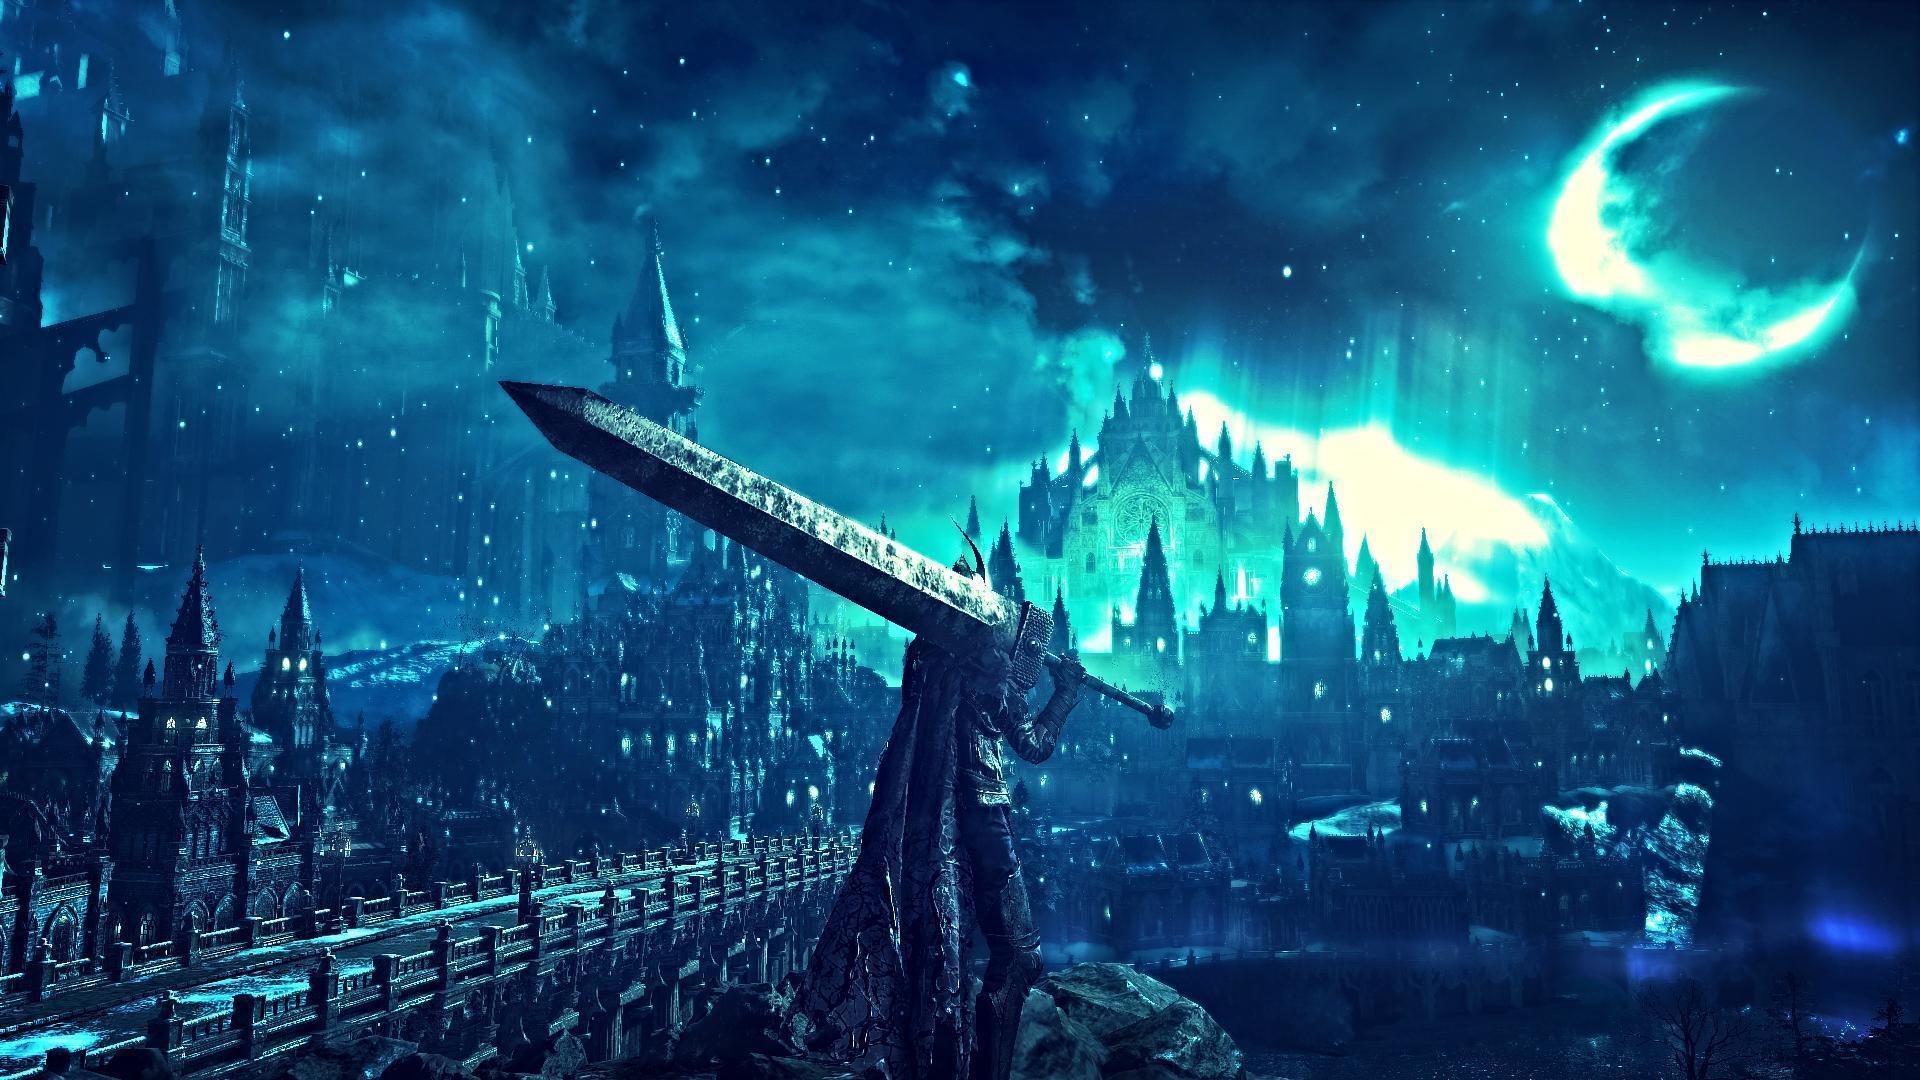 Dark Souls Wallpapers Hd для андроид скачать Apk